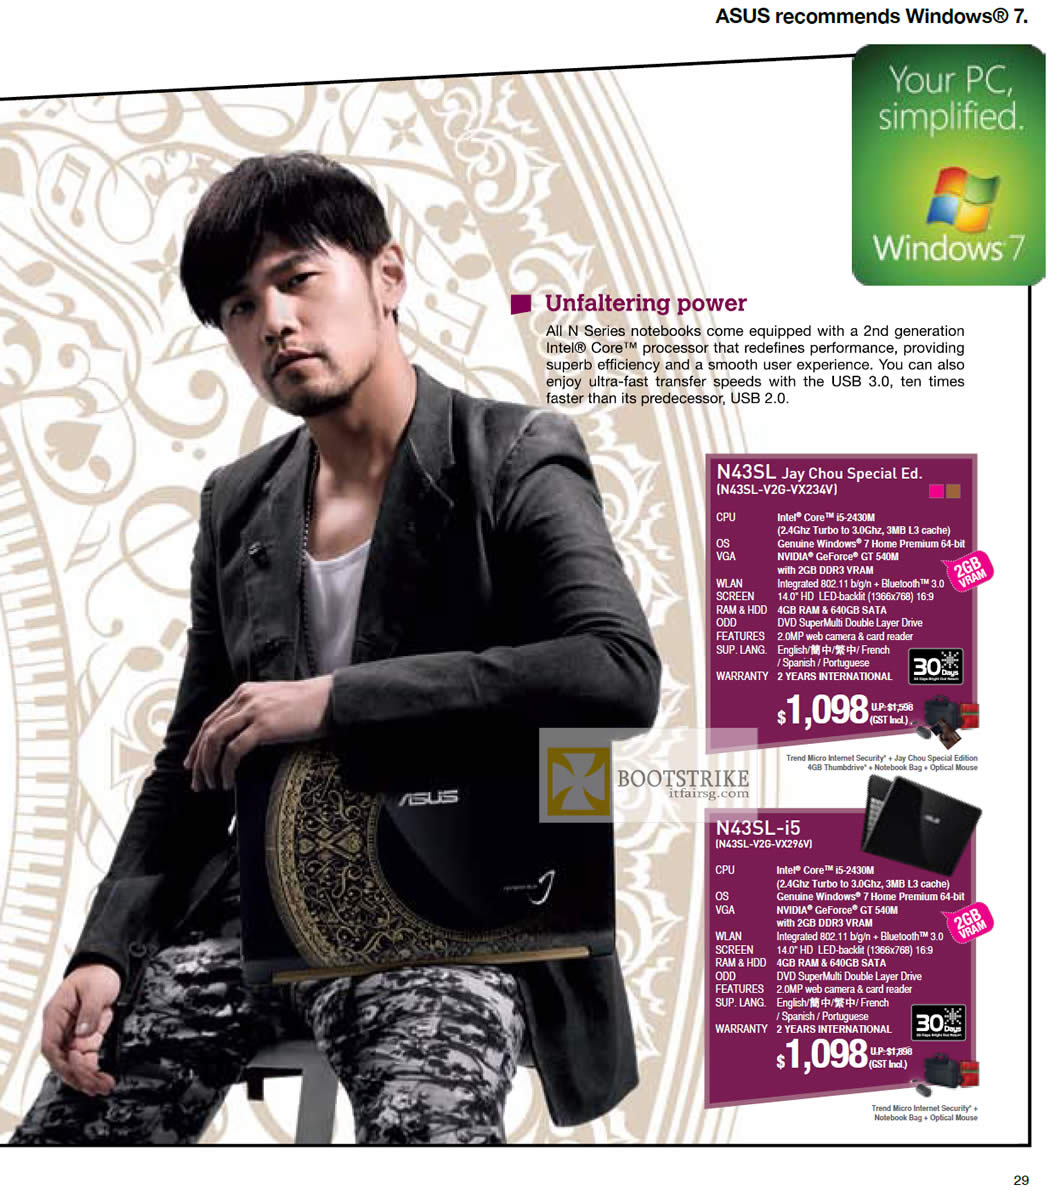 IT SHOW 2012 price list image brochure of ASUS Notebooks N Series Jay Chou Special Ed N42SL-V2G-VX234V, N43SL-V2G-VX296V